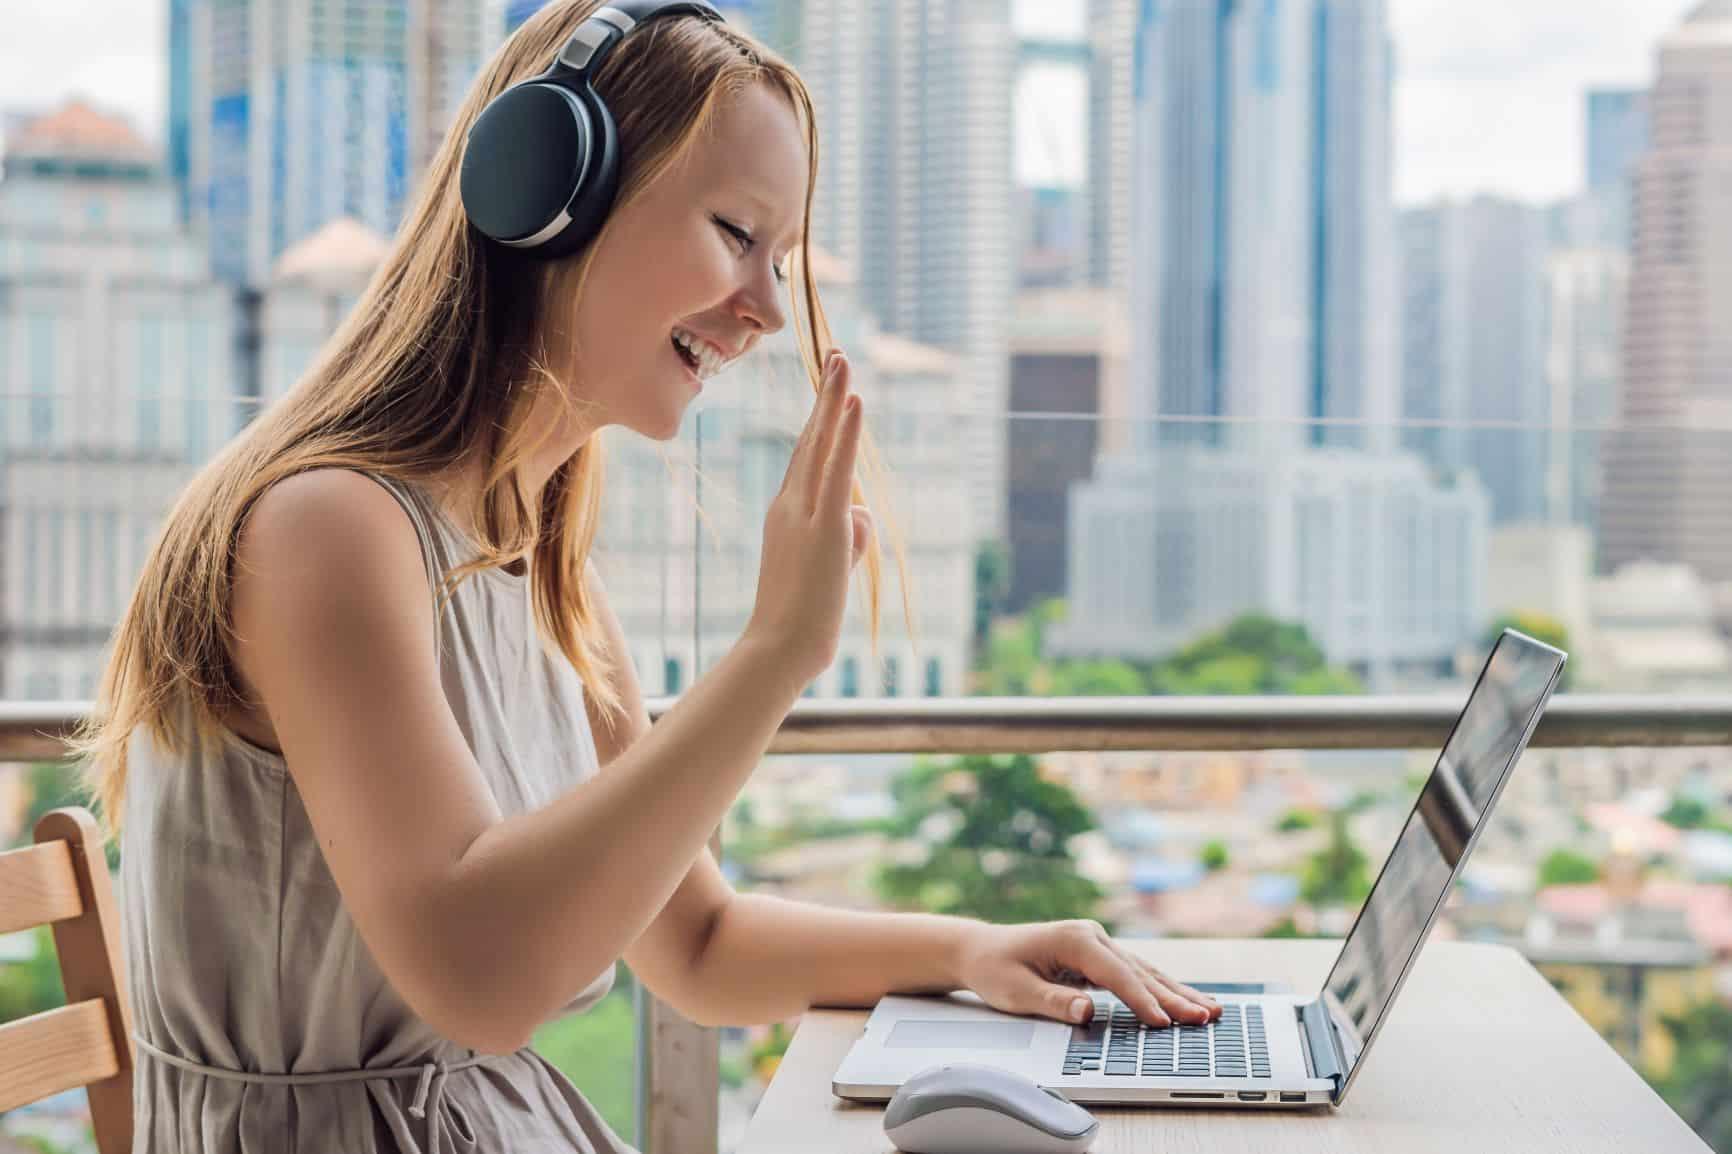 teach an online course step-by-step